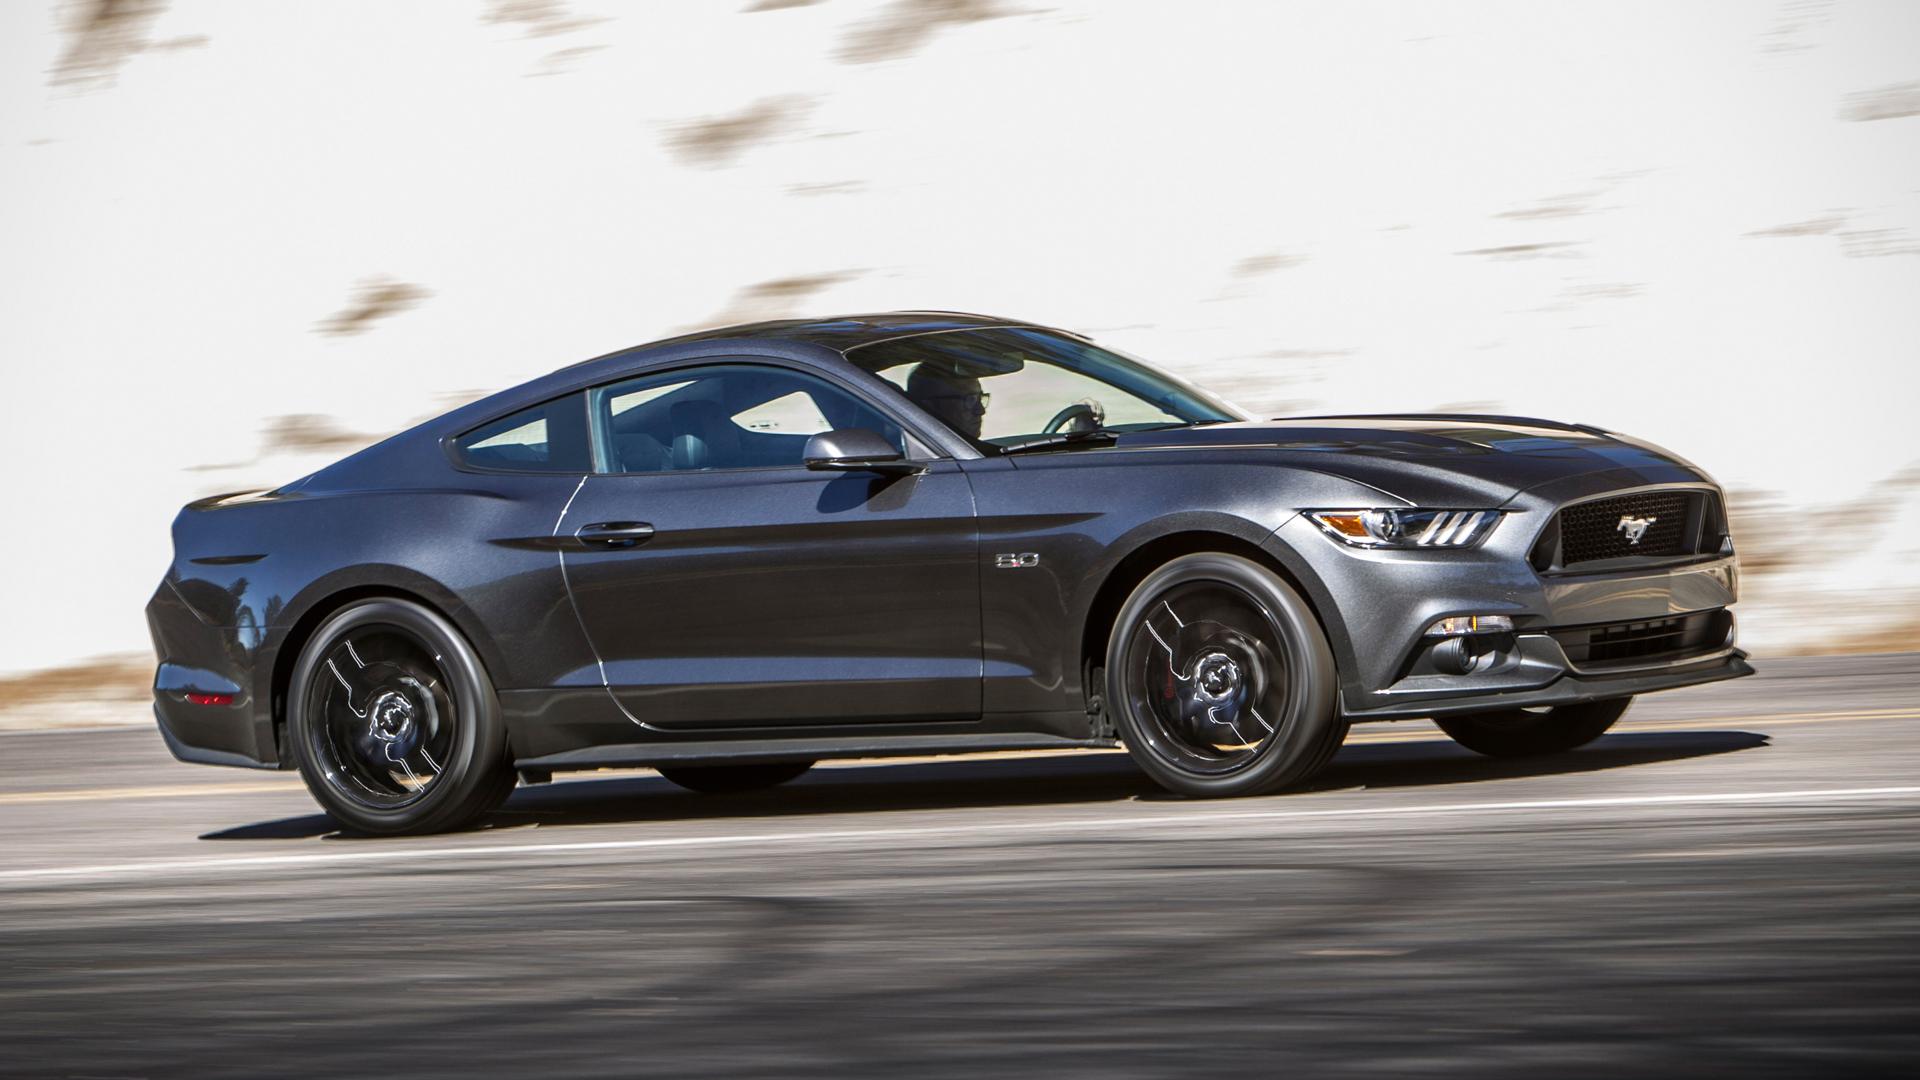 Ford Mustang Gt 2017 Wallpaper